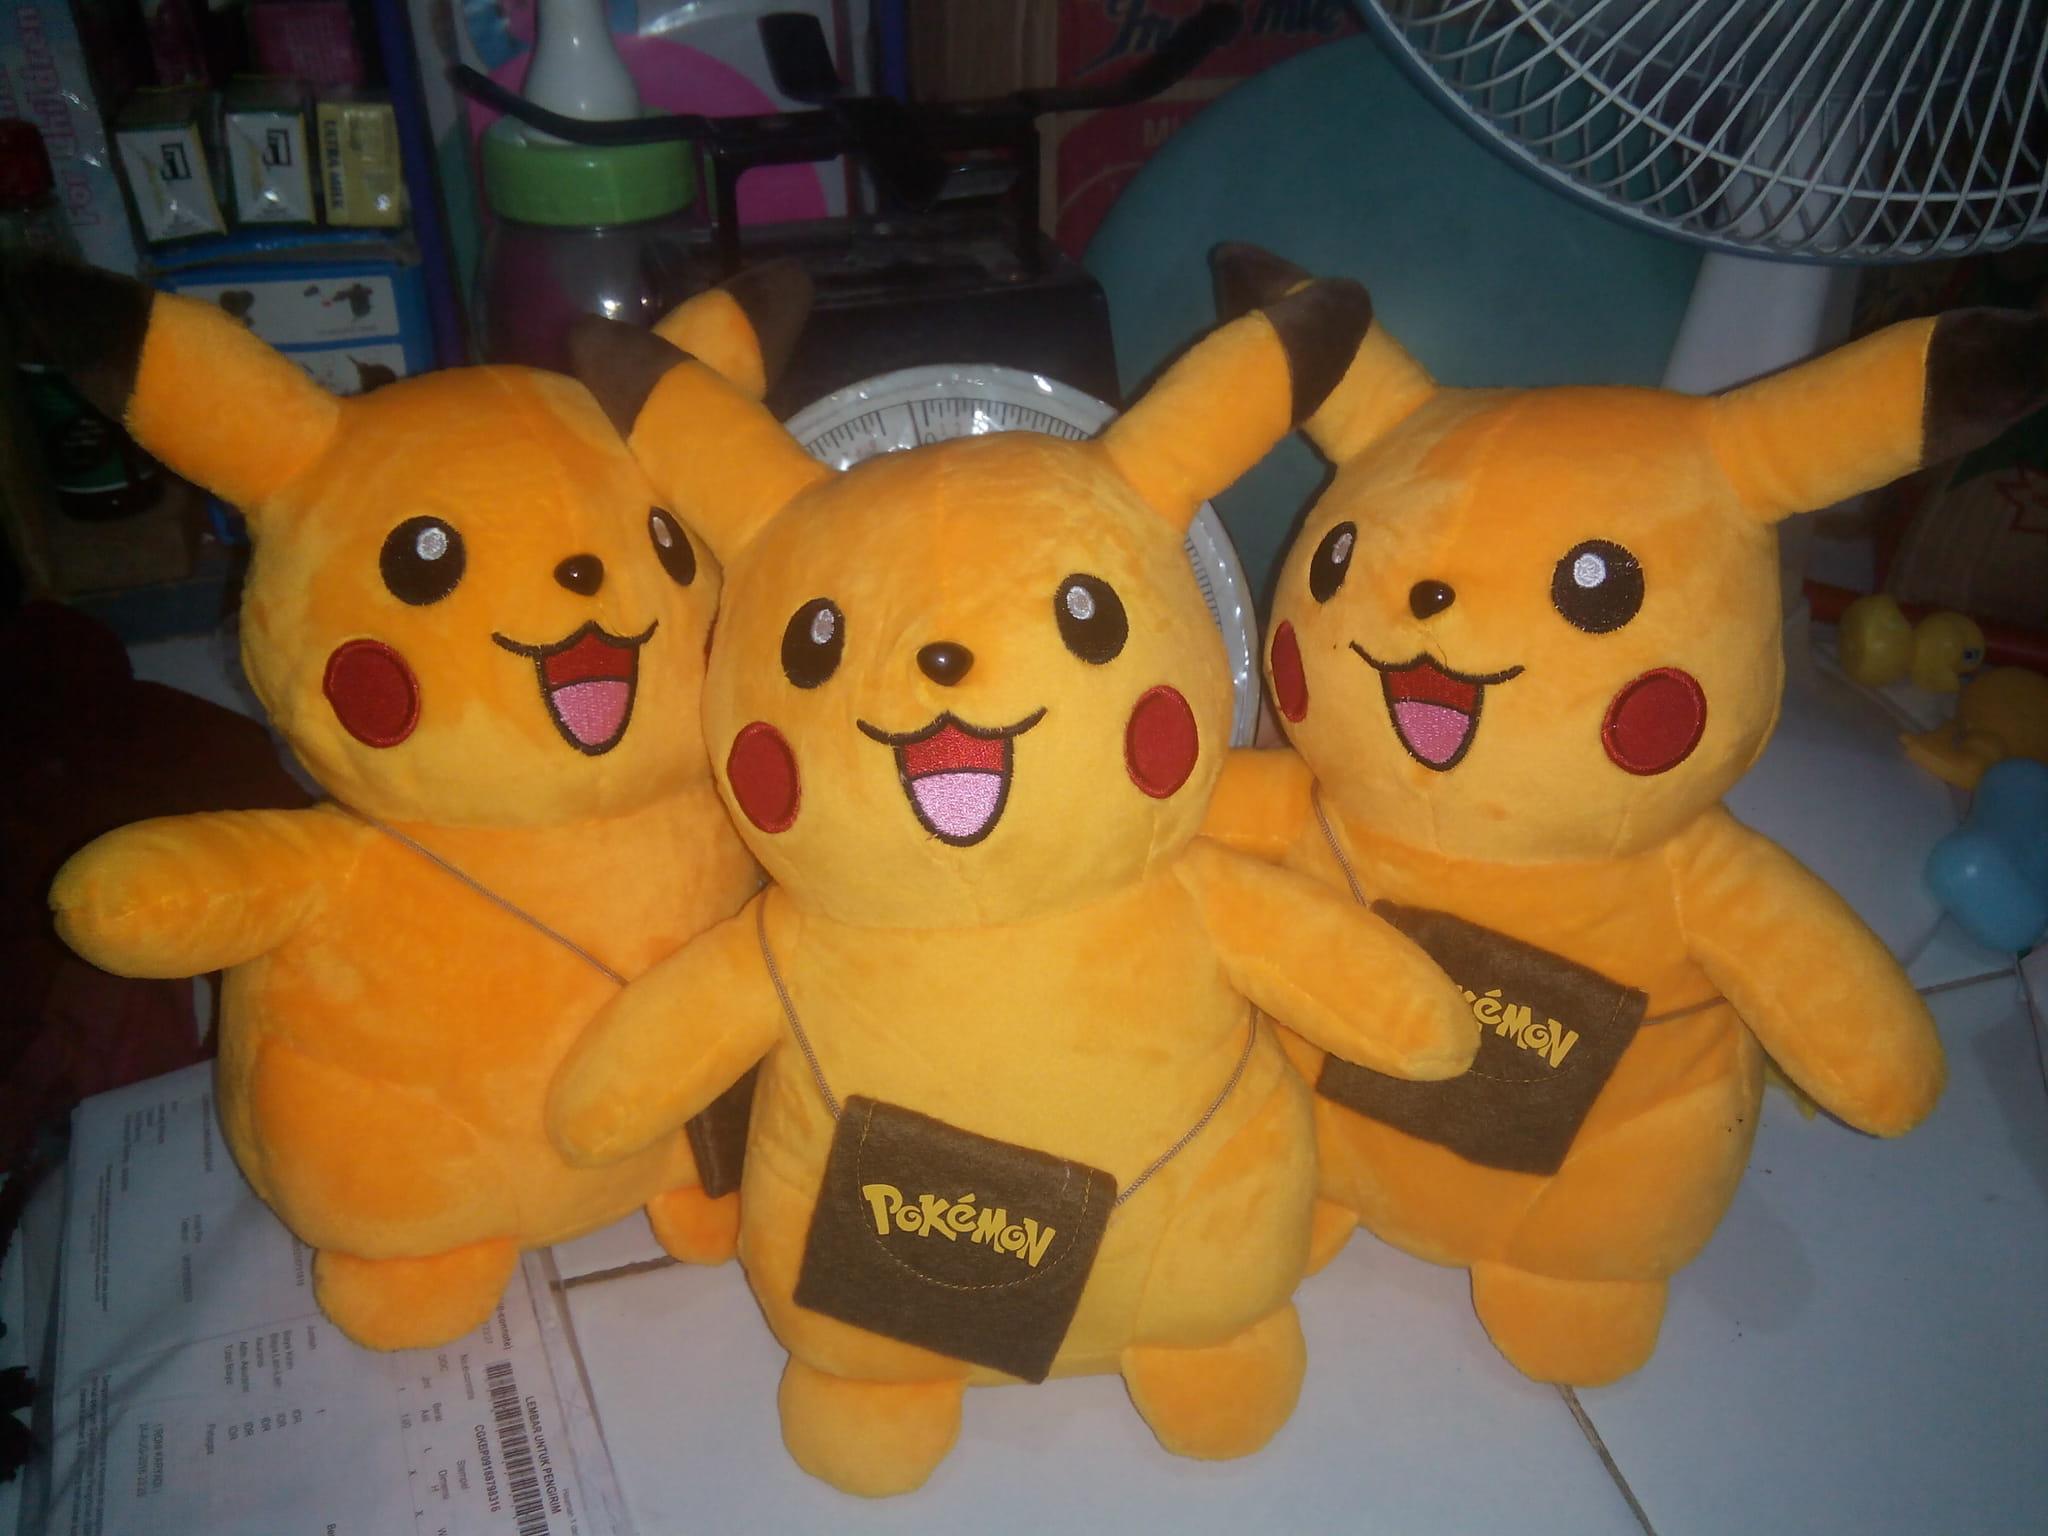 Jual Boneka Pokemon Go Si Pikachu Ada Kantong Ajaib M Ajo Toys Tokopedia